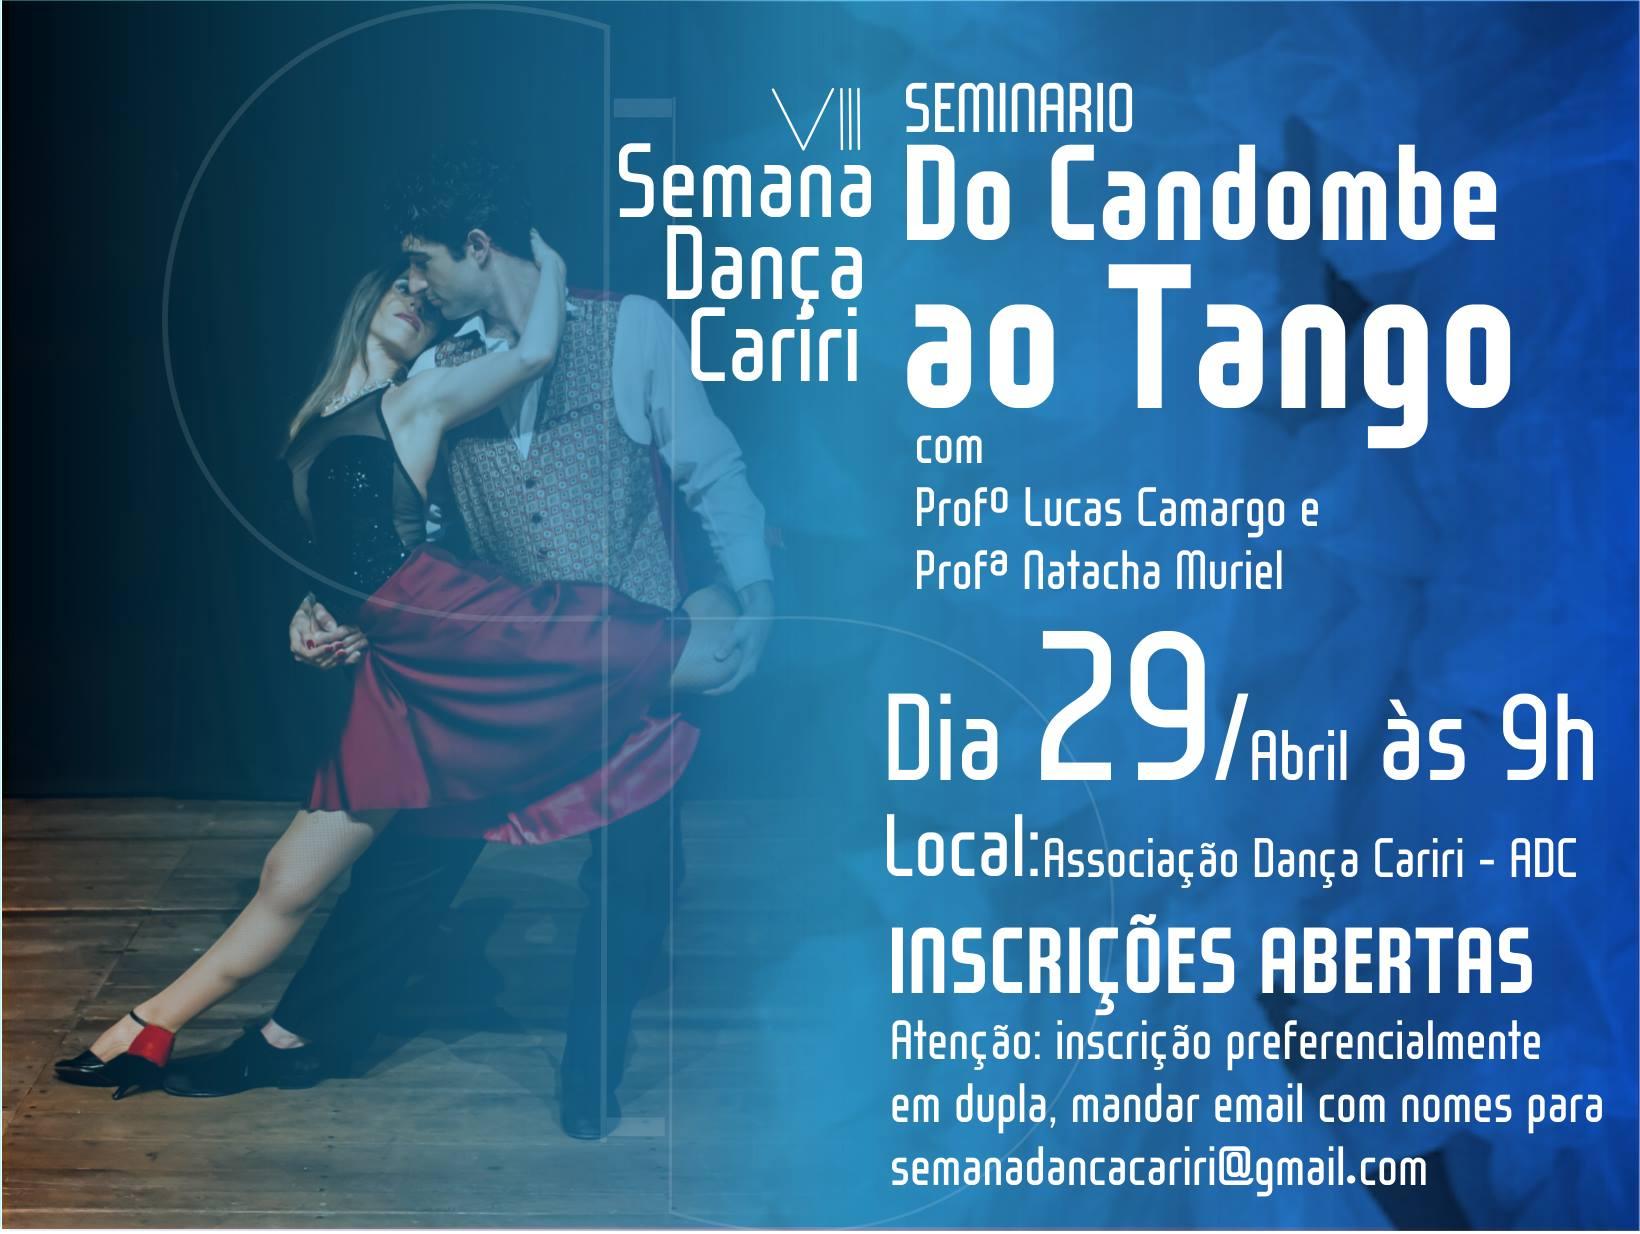 Do candombe ao tango